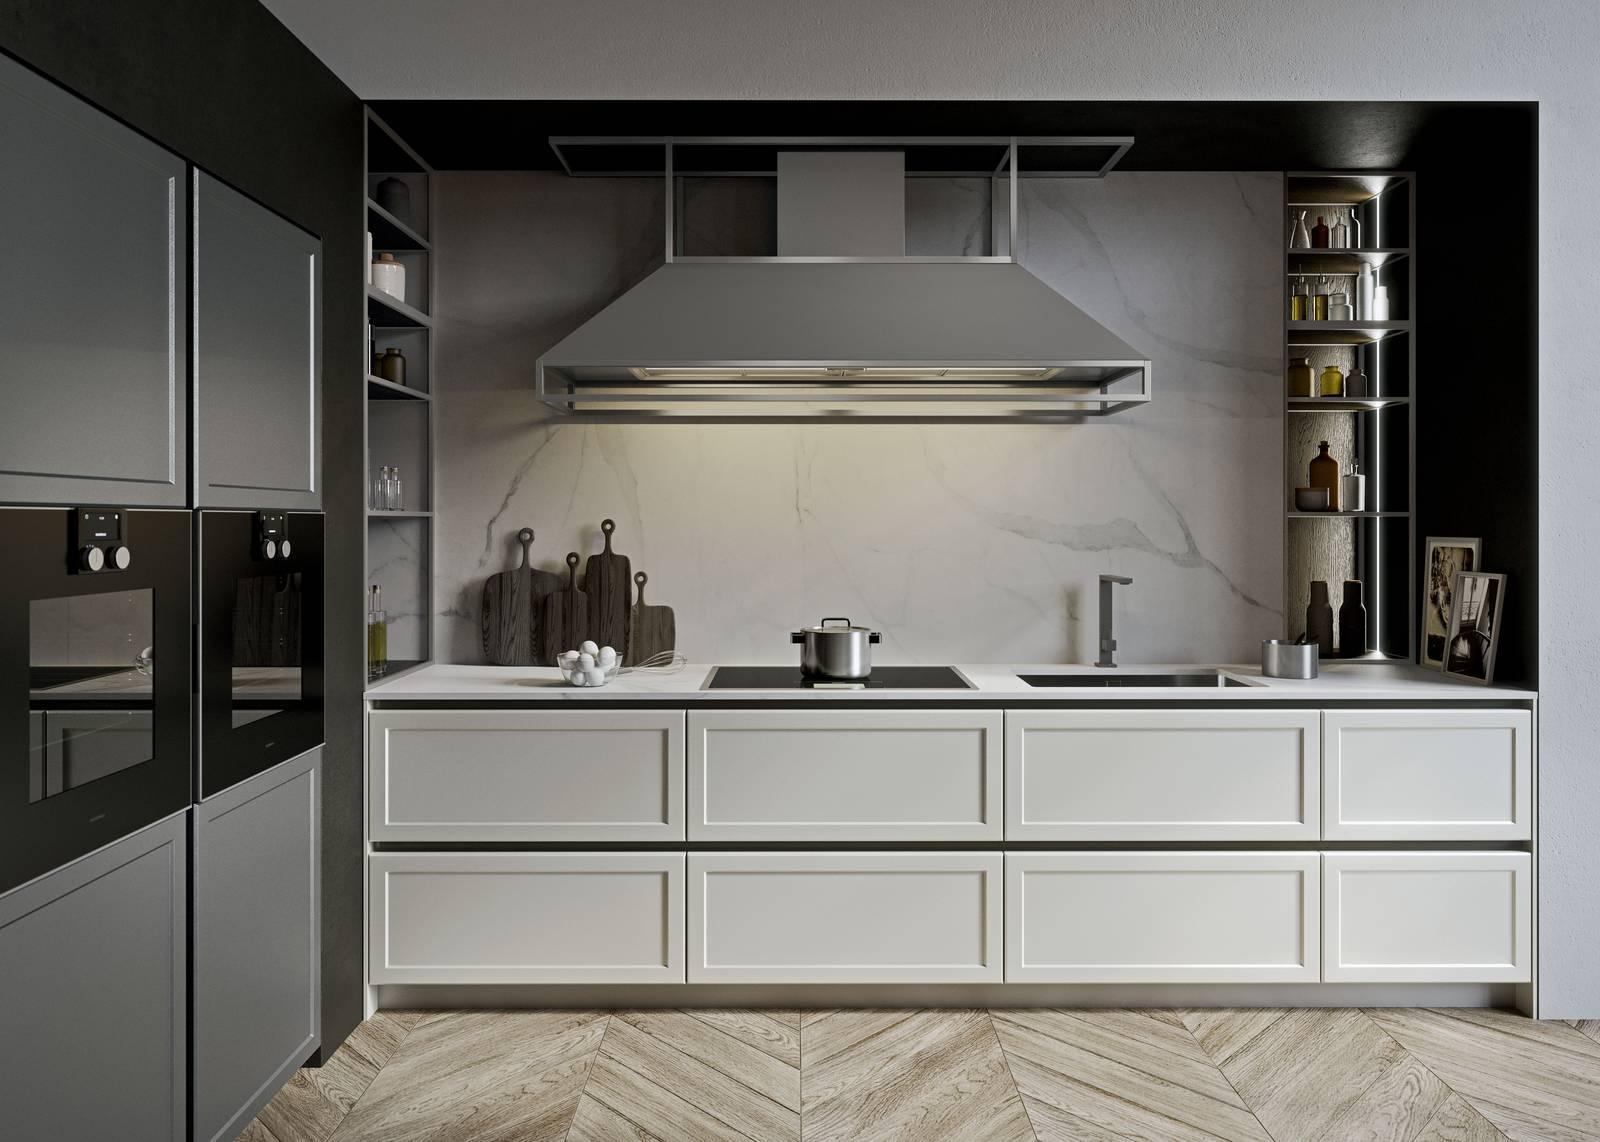 Top Cucina Marmo Bianco | Bello Top Cucina In Marmo Bianco Carrara ...